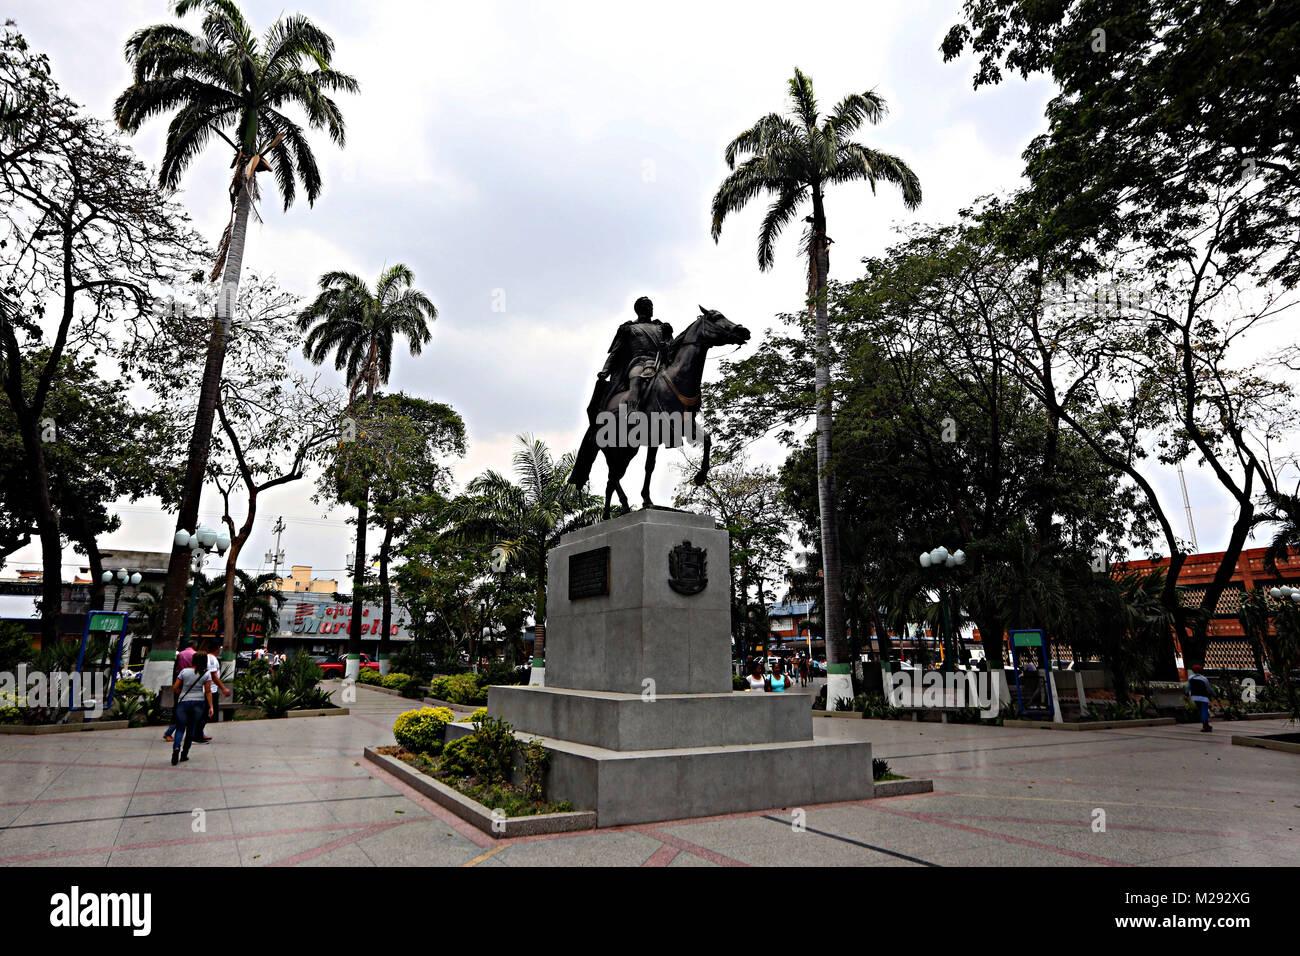 Acarigua 1st Apr 2015 Araure Portuguesa Venezuela April 01 Stock Photo Alamy